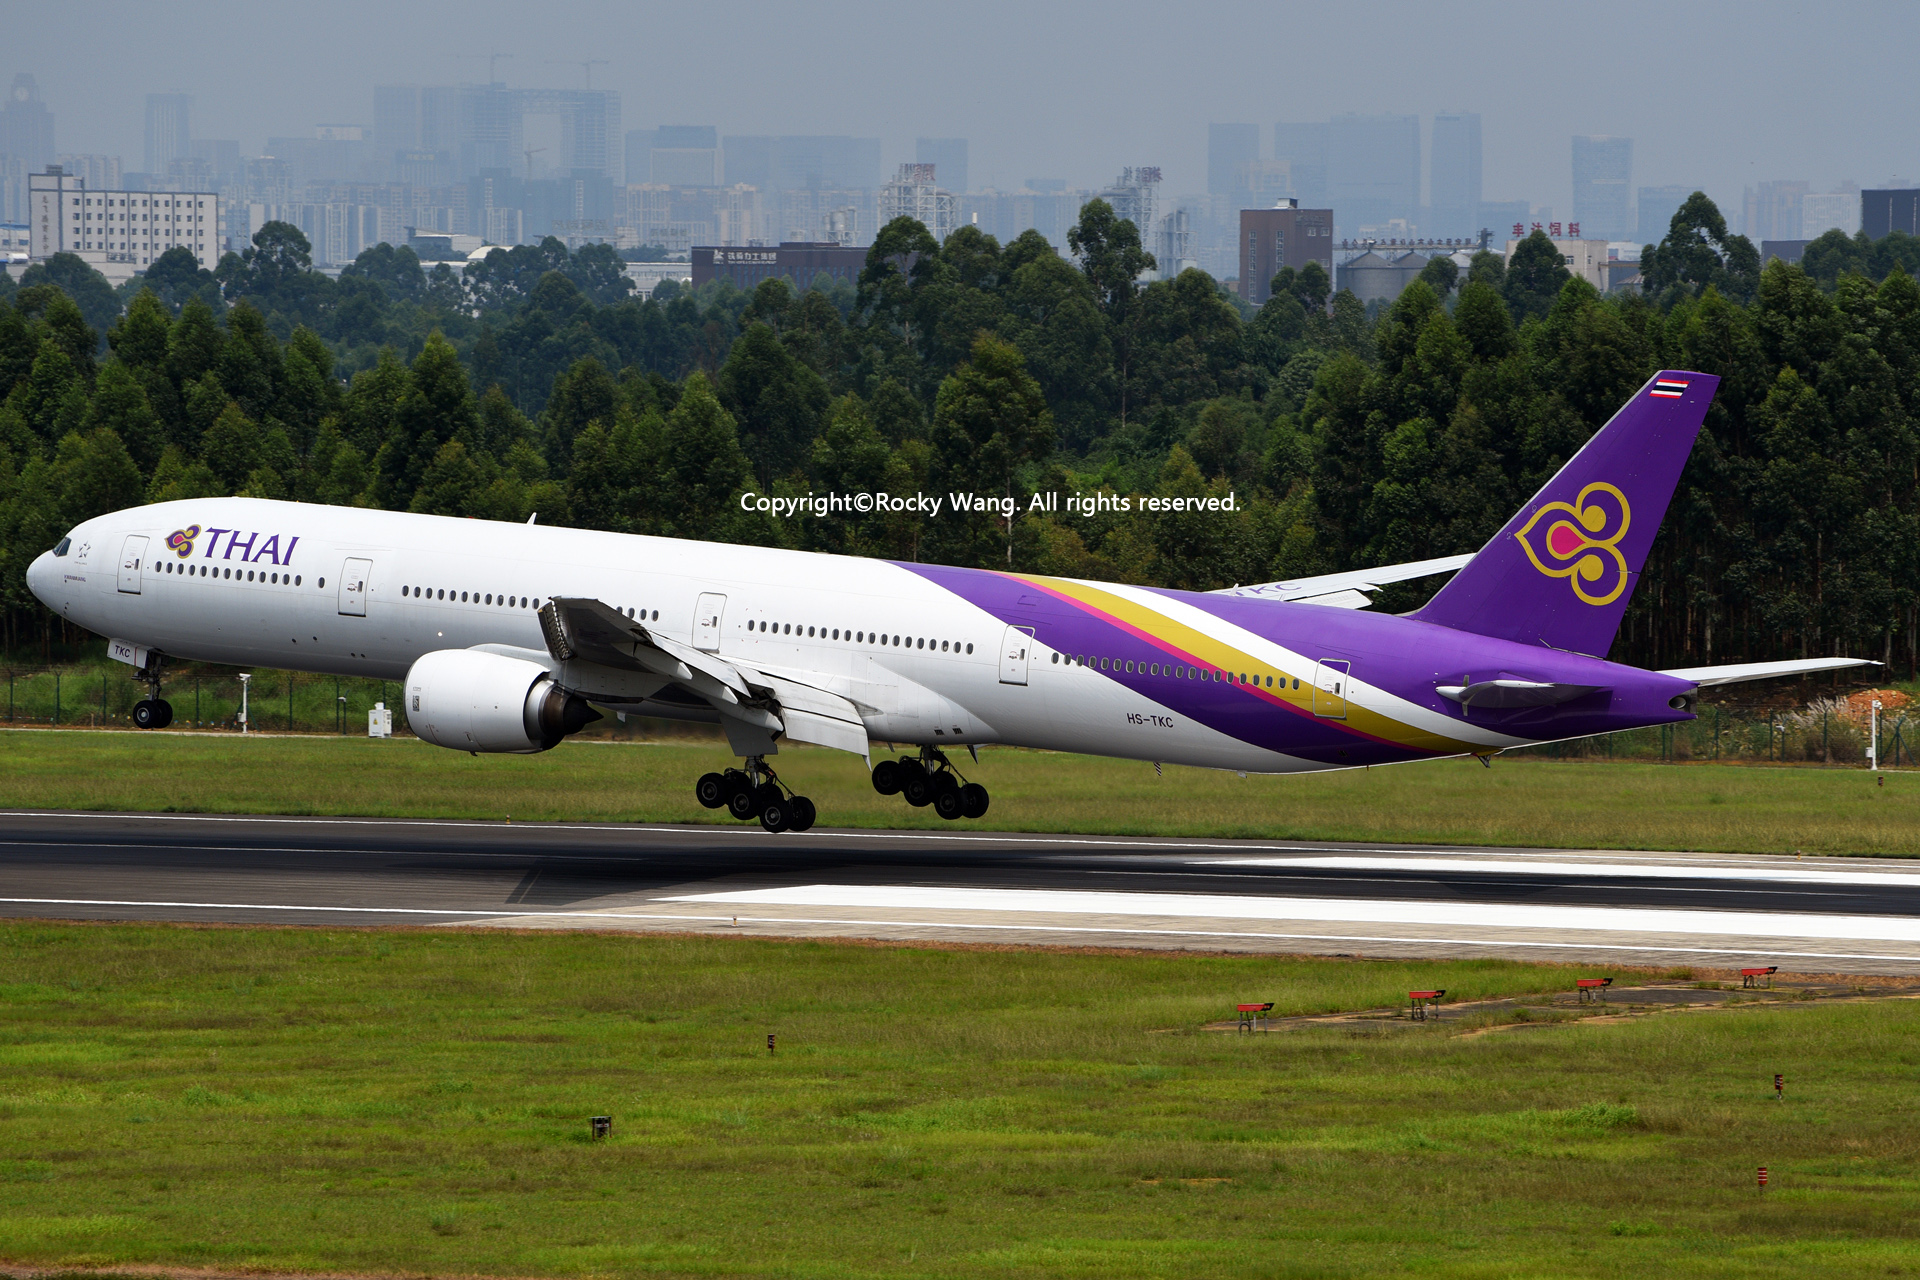 Re:[原创]居家了 批量处理老图 倾情奉献52家777 BOEING 777-3D7 HS-TKC Chengdu Shuangliu